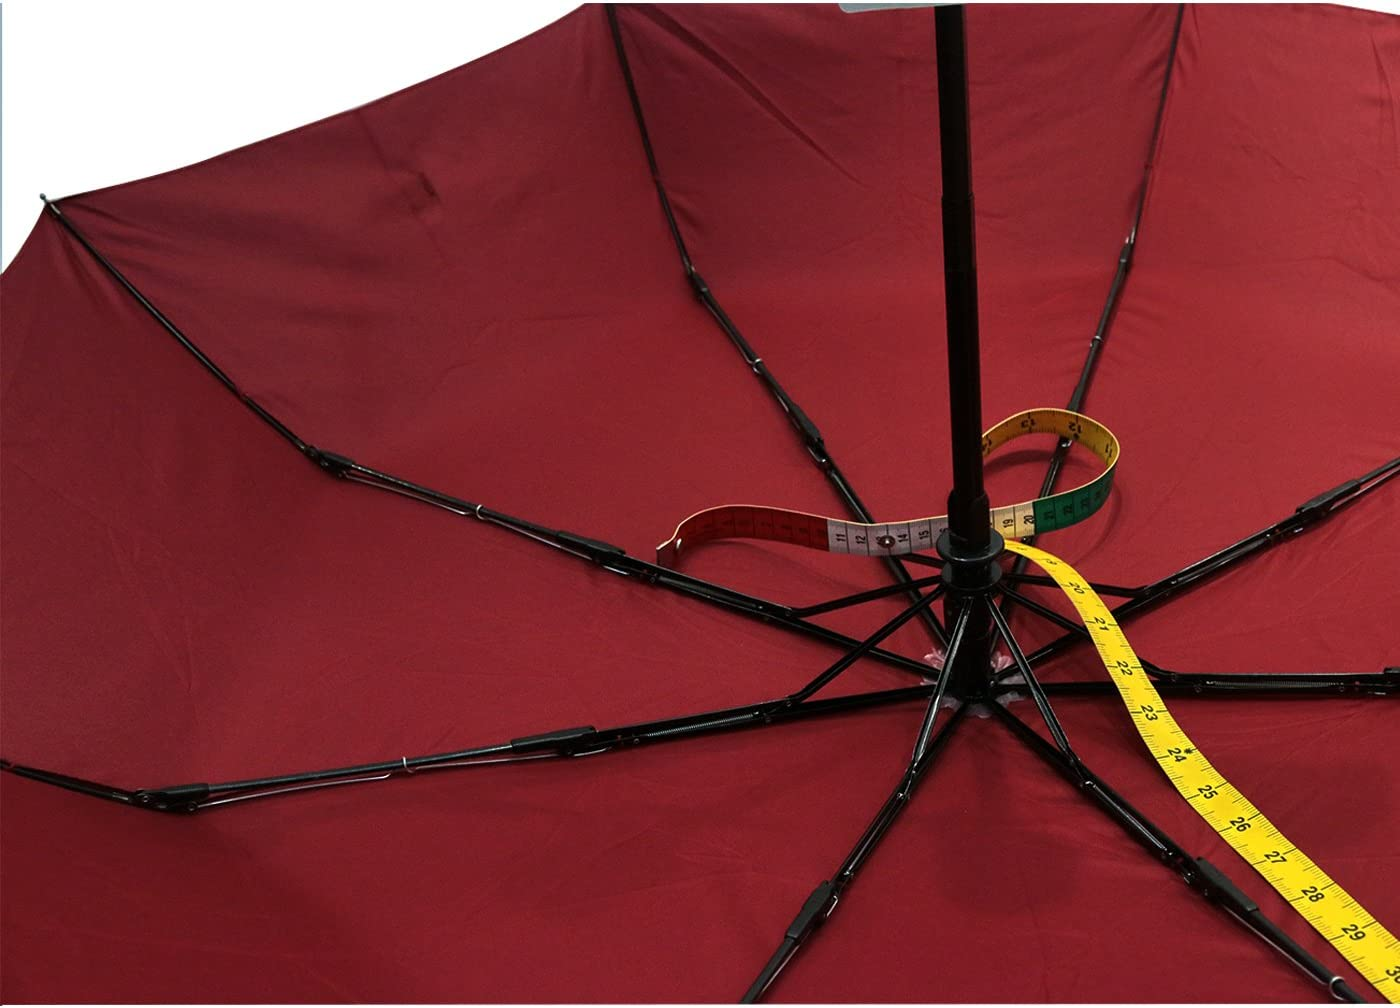 WINE MEROCKER Teflon Coated Auto Open and Close Umbrella Compact Travel Umbrella Waterproof and Windproof Function Slim Size